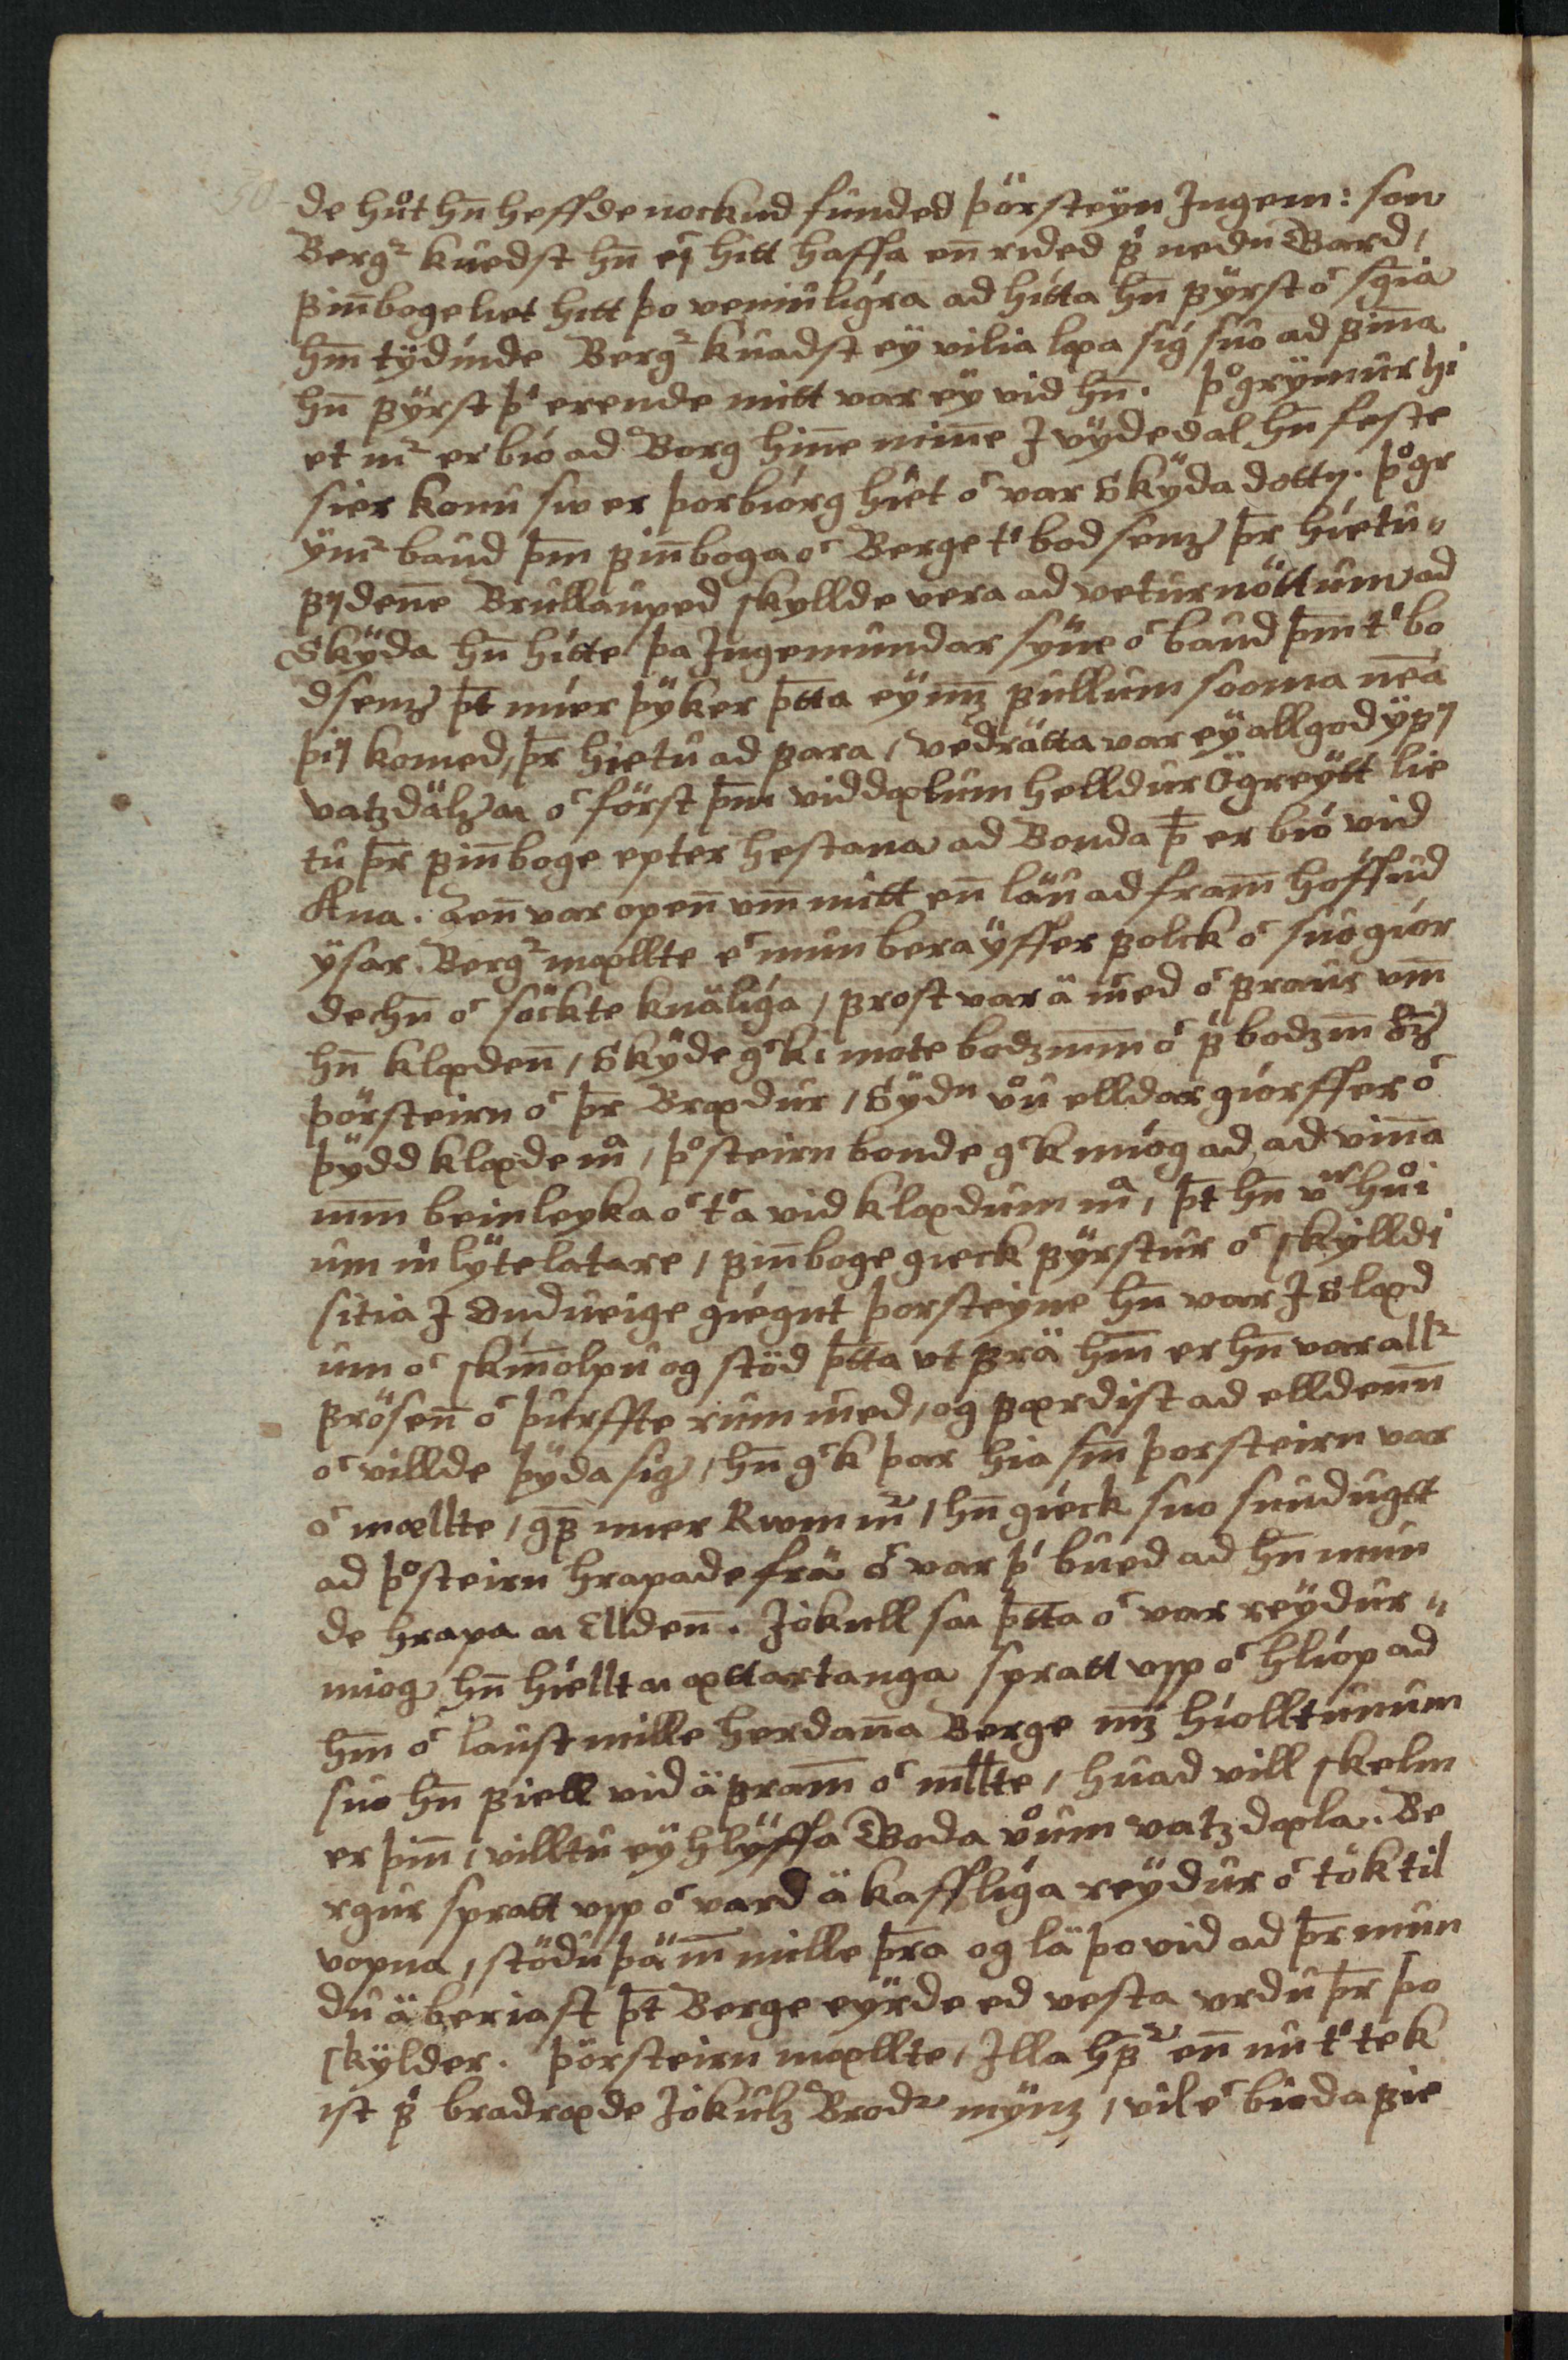 AM 138 fol - 25v